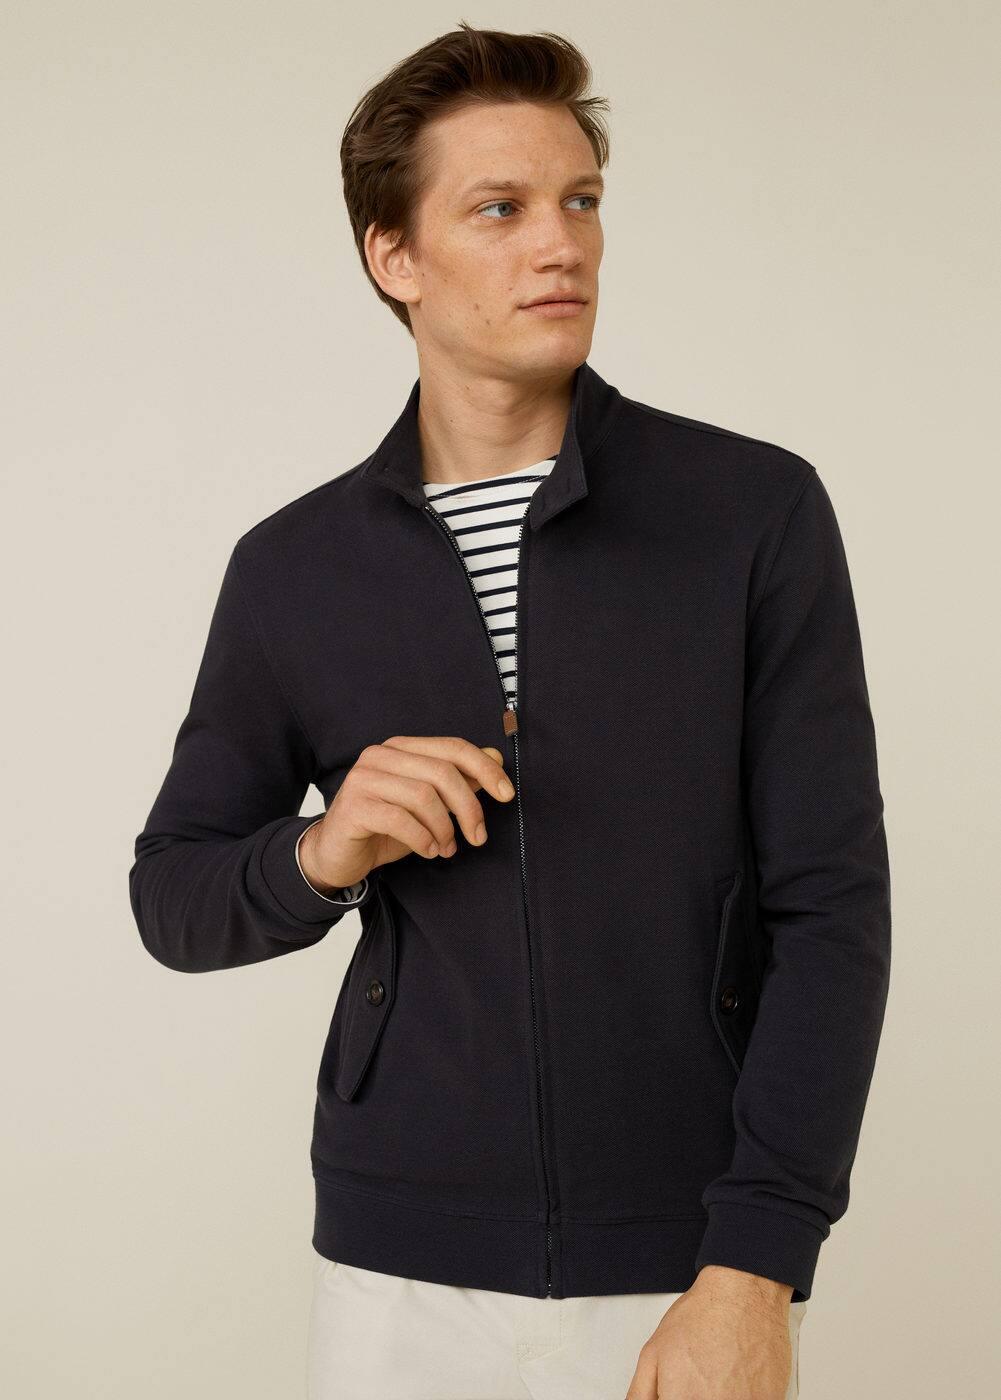 Cotton Piqué Jacket by Mango